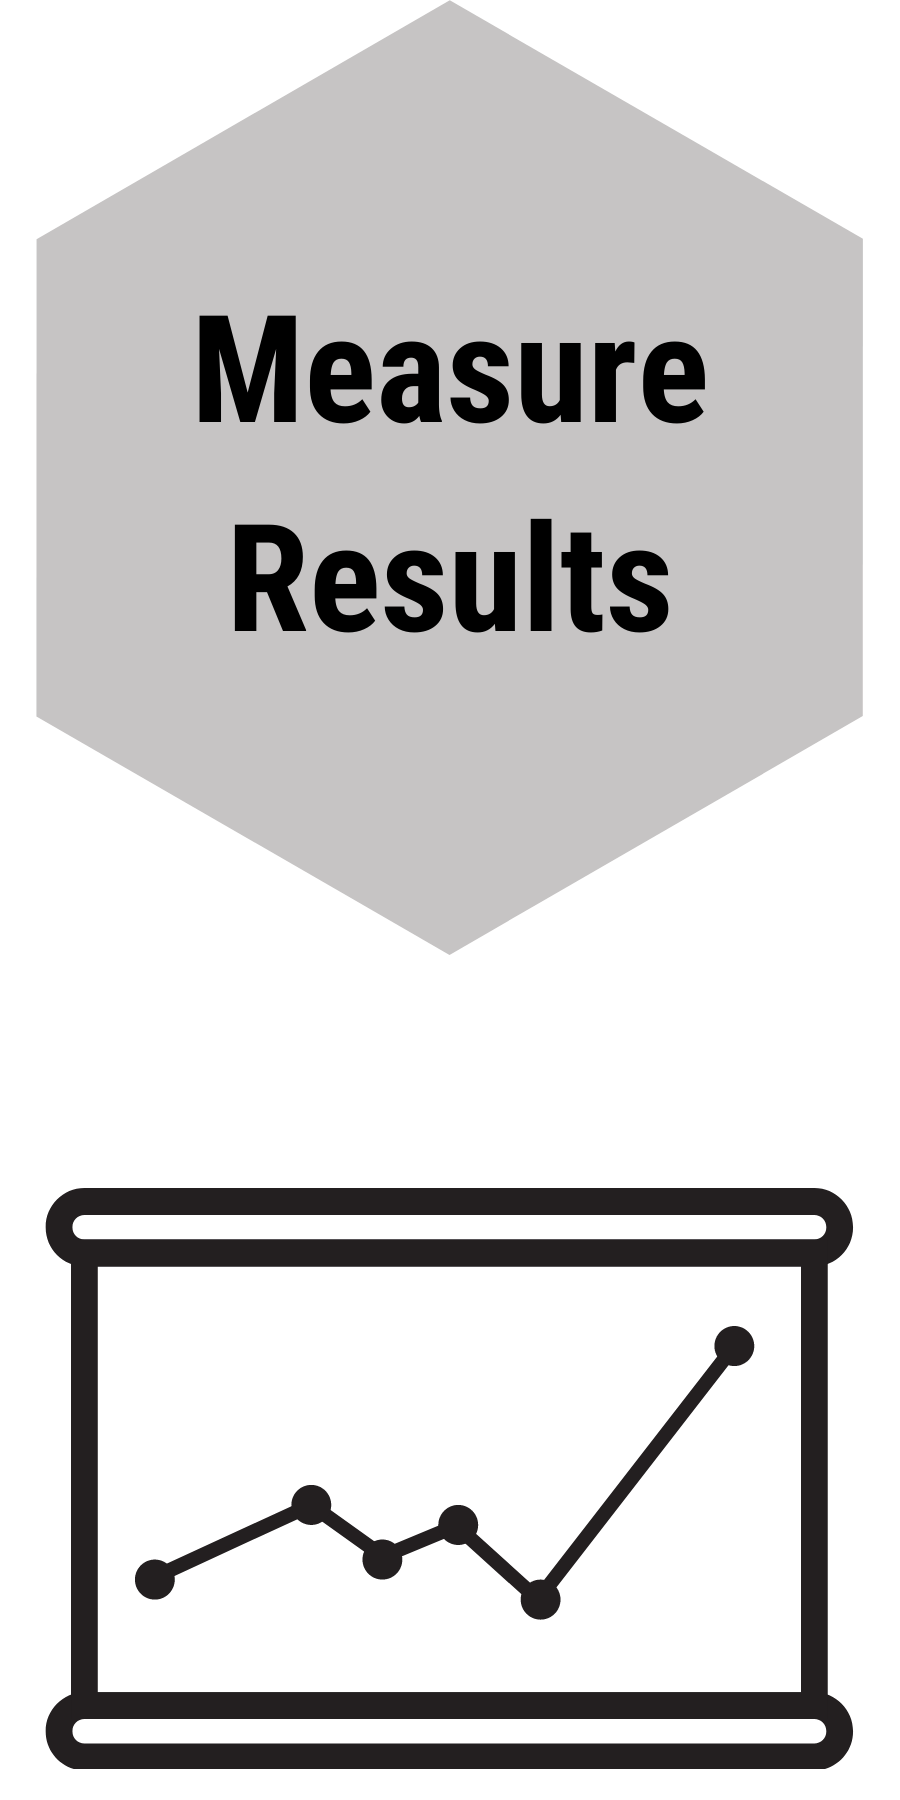 Measure Results to Transform Organizational Training